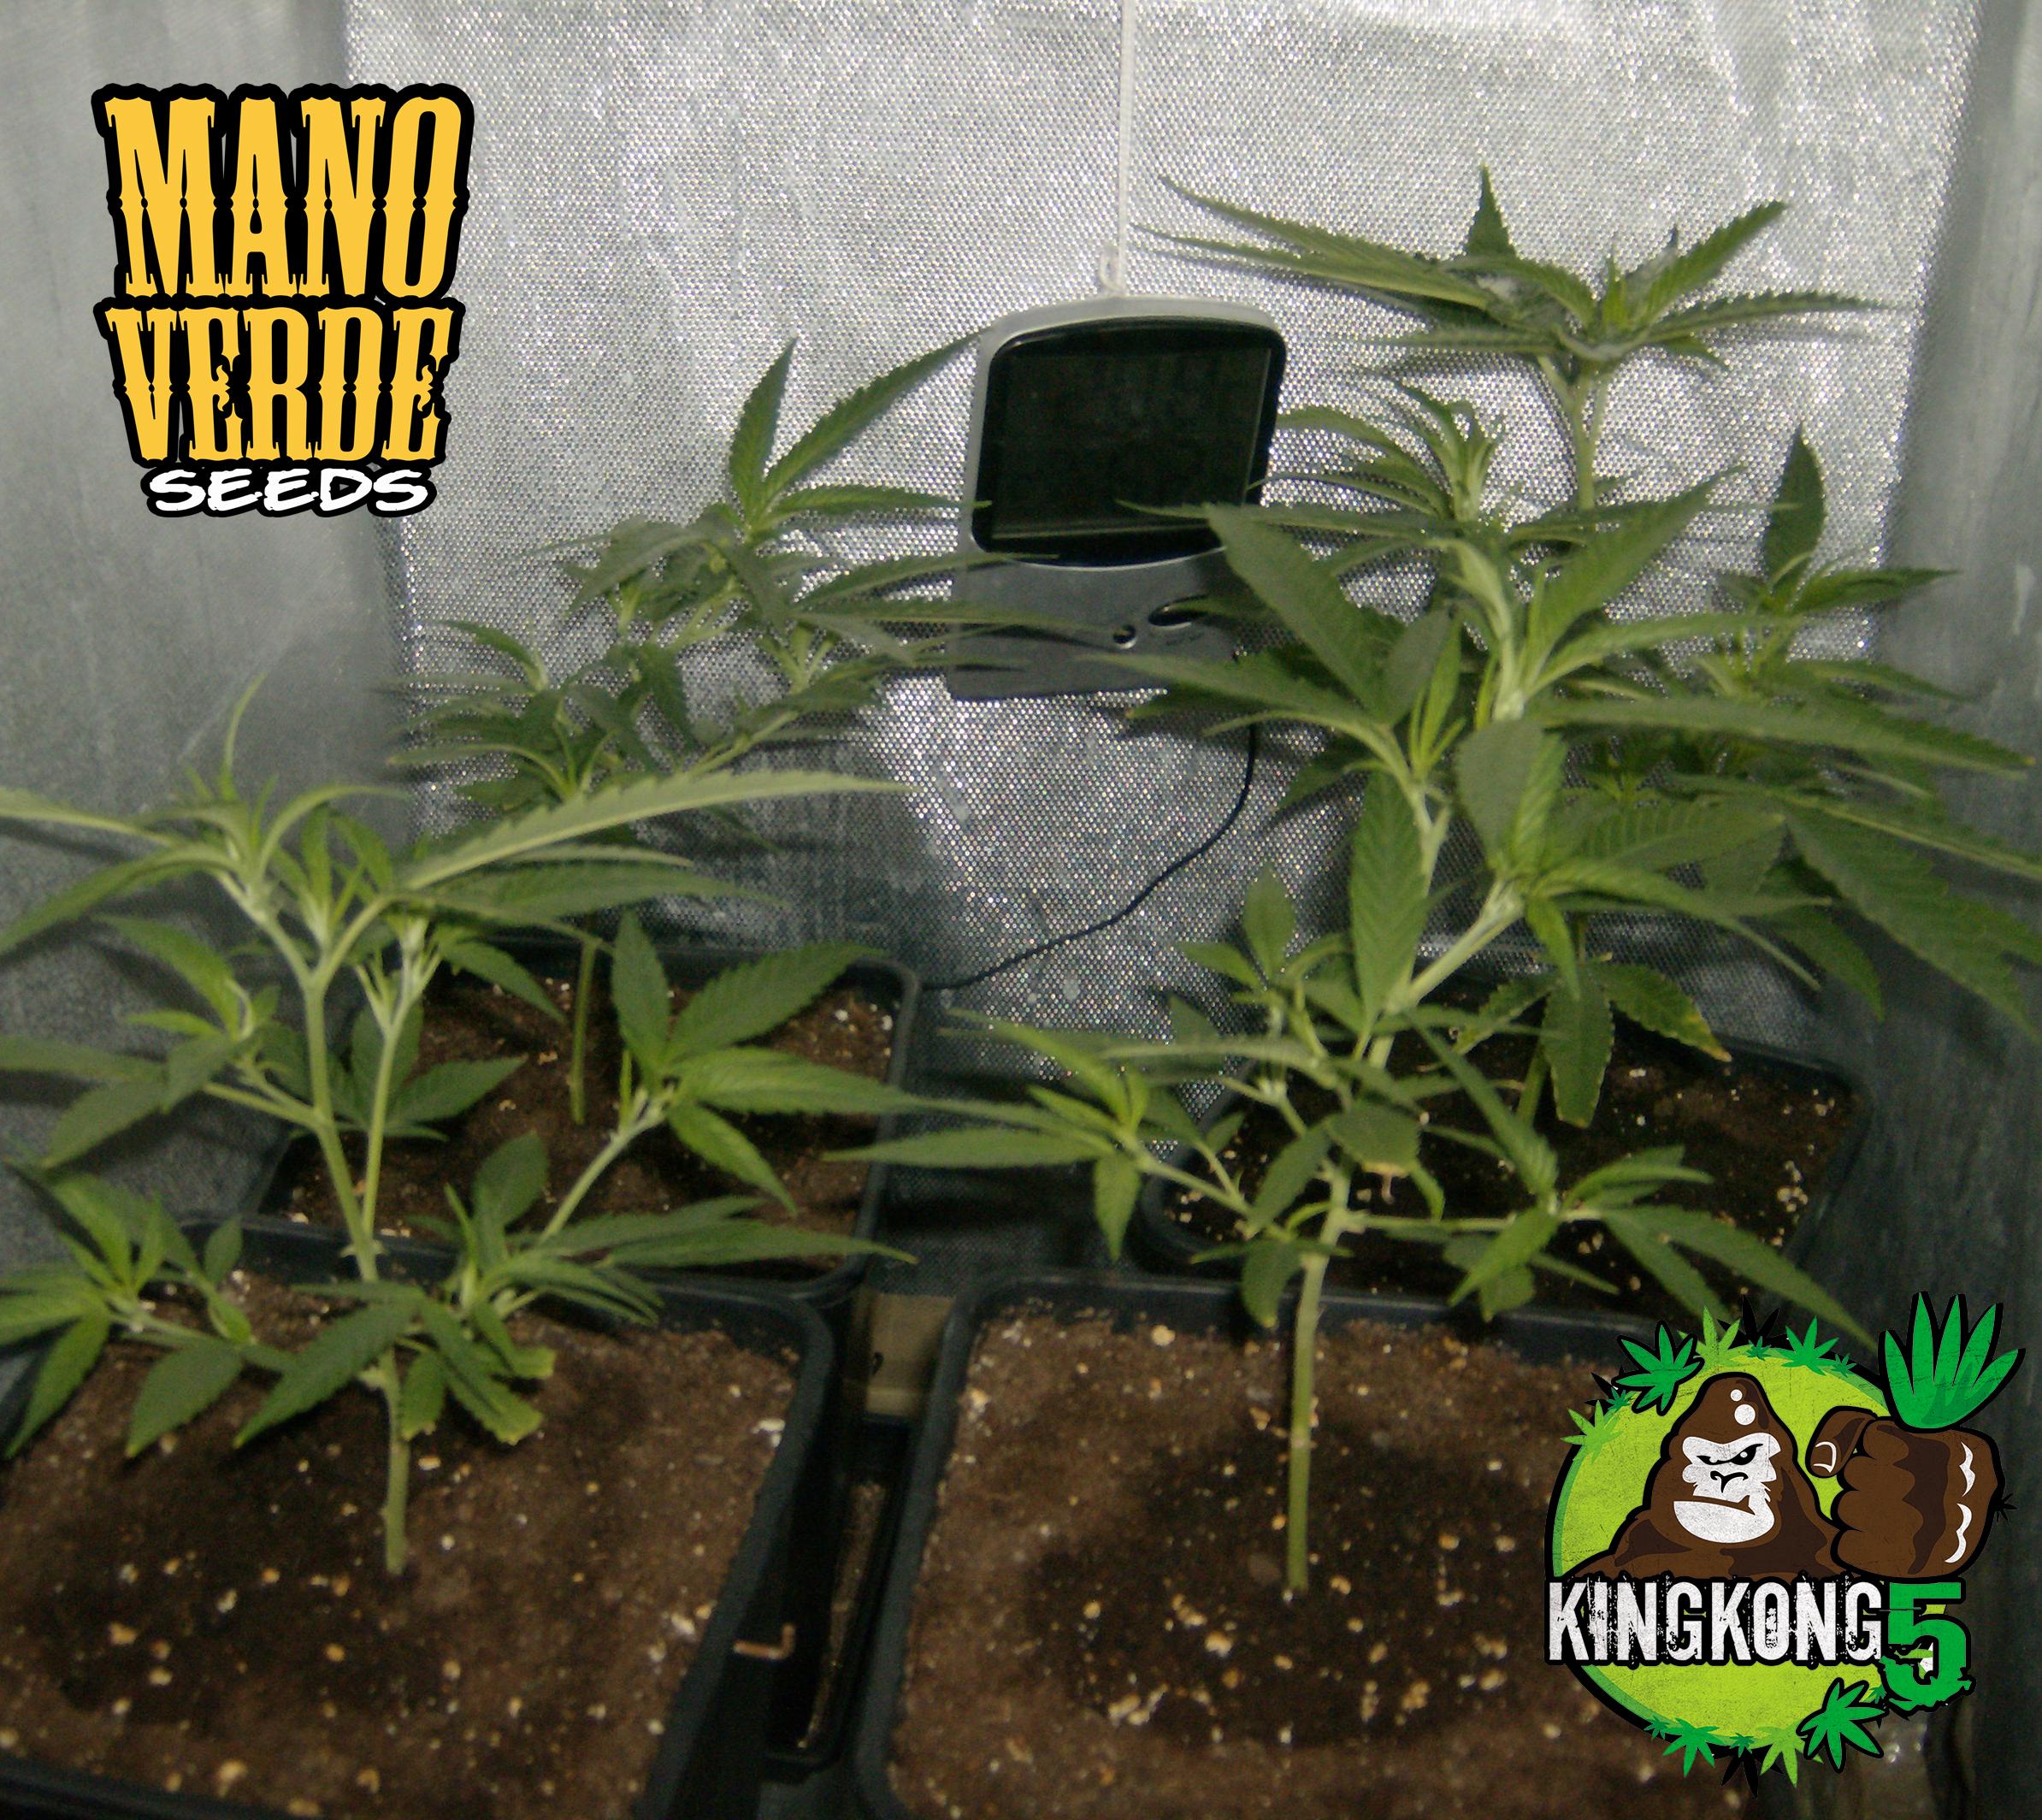 King Kong Five Manoverde Seeds 16C-3F-150